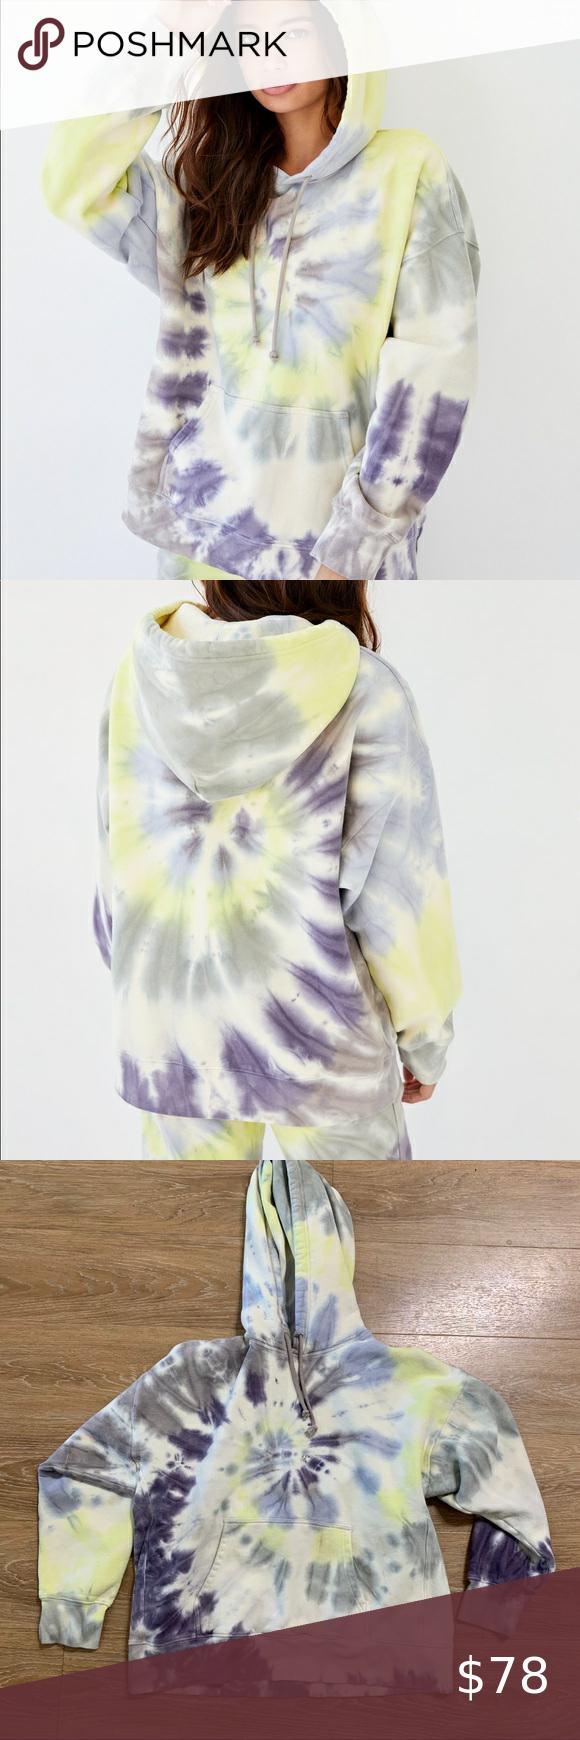 Aritzia Tie Dye Hoodie Tie Dye Hoodie Clothes Design Tie Dye [ 1740 x 580 Pixel ]